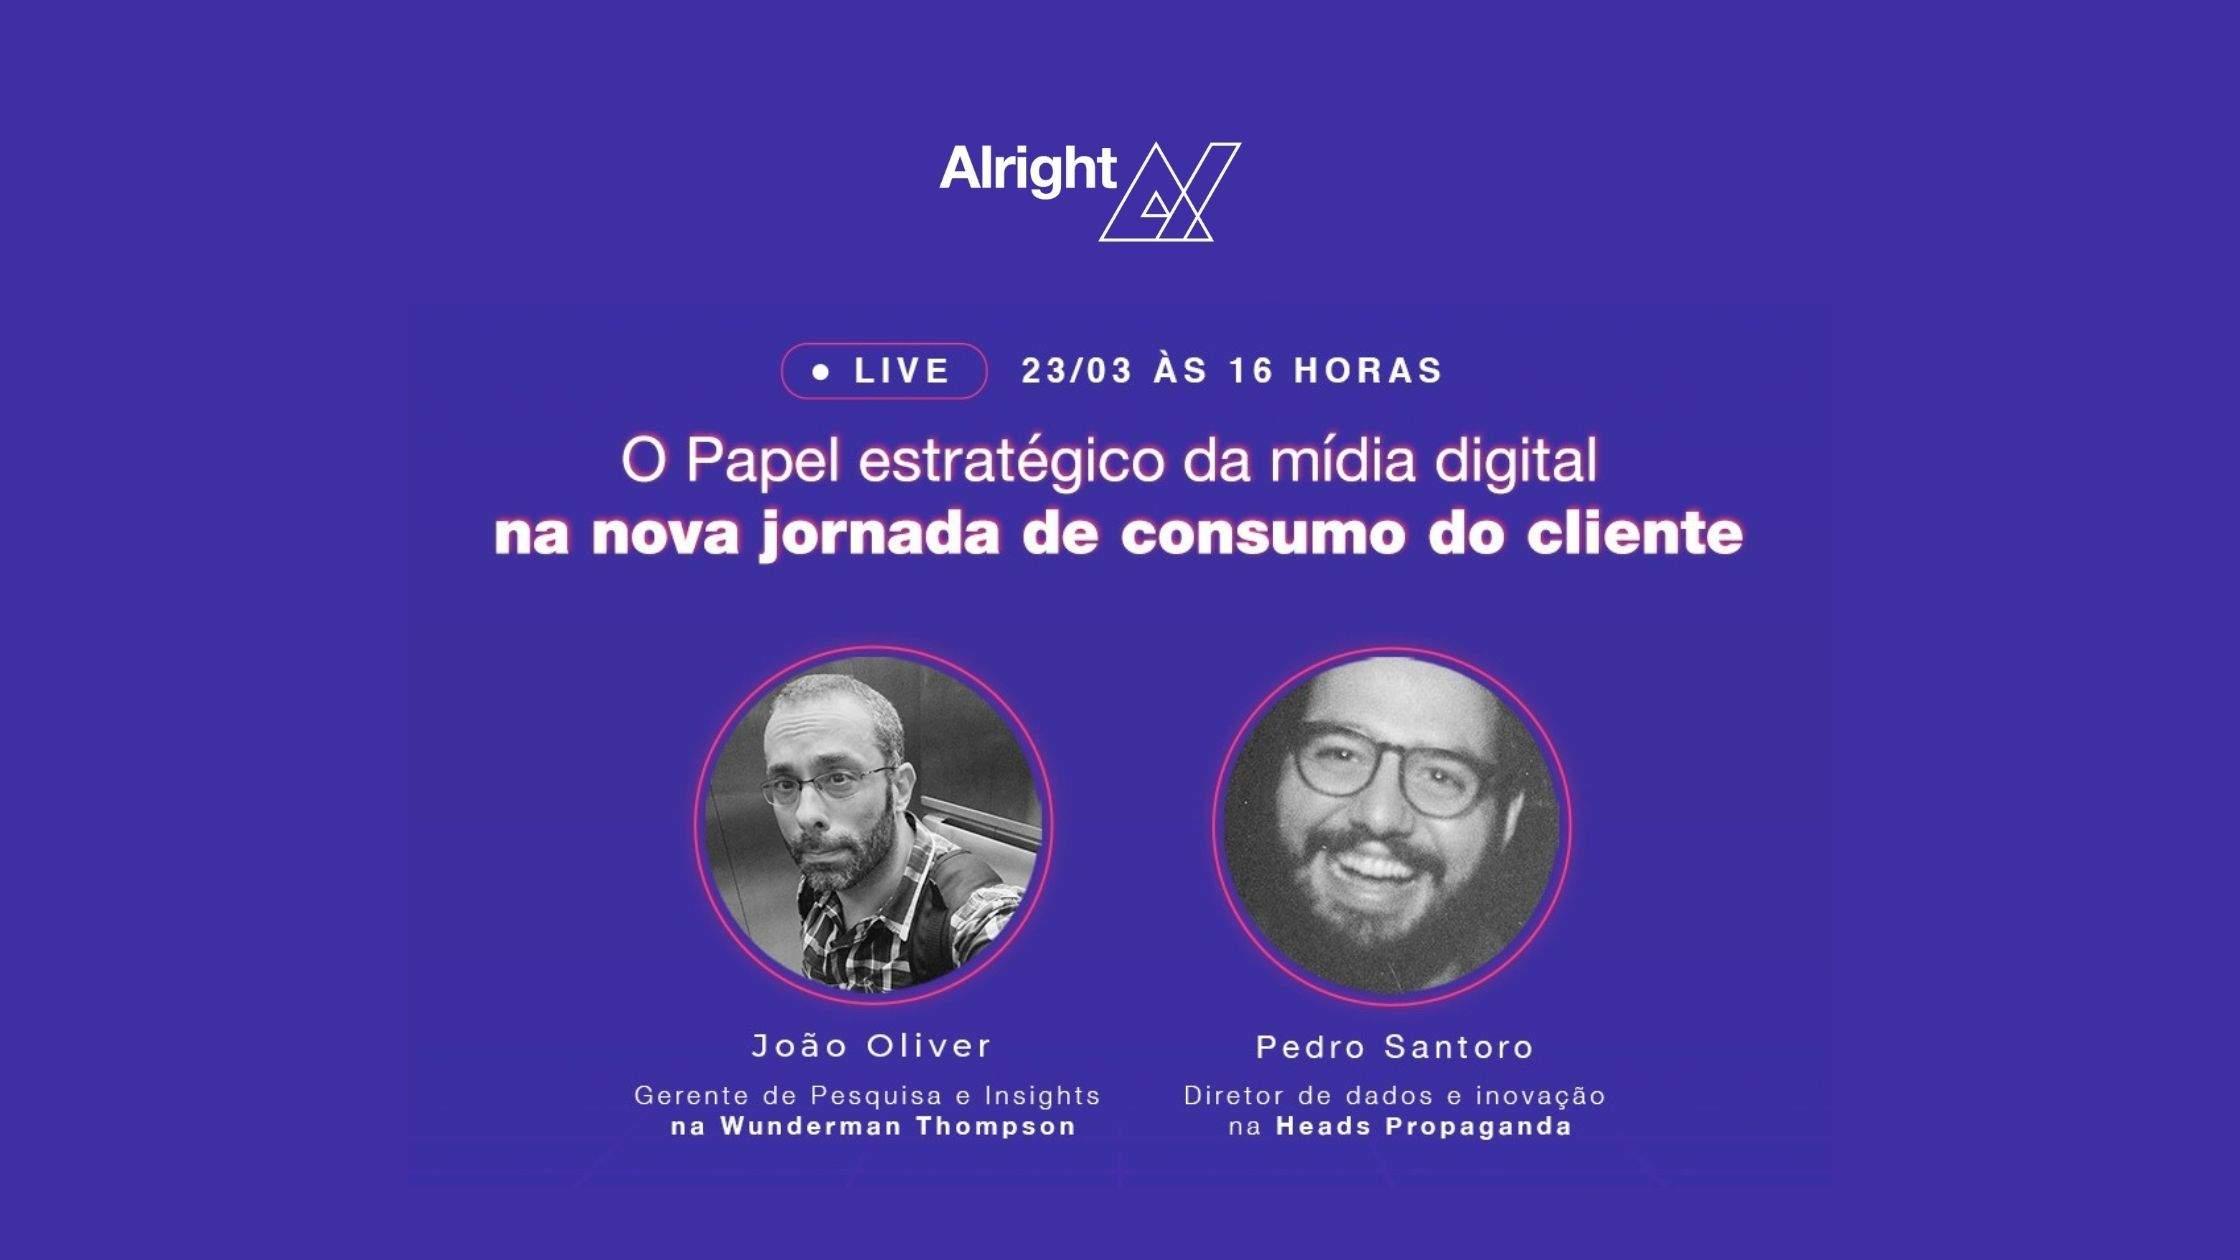 Live Alright AdTech mídia digital jornada do consumidor